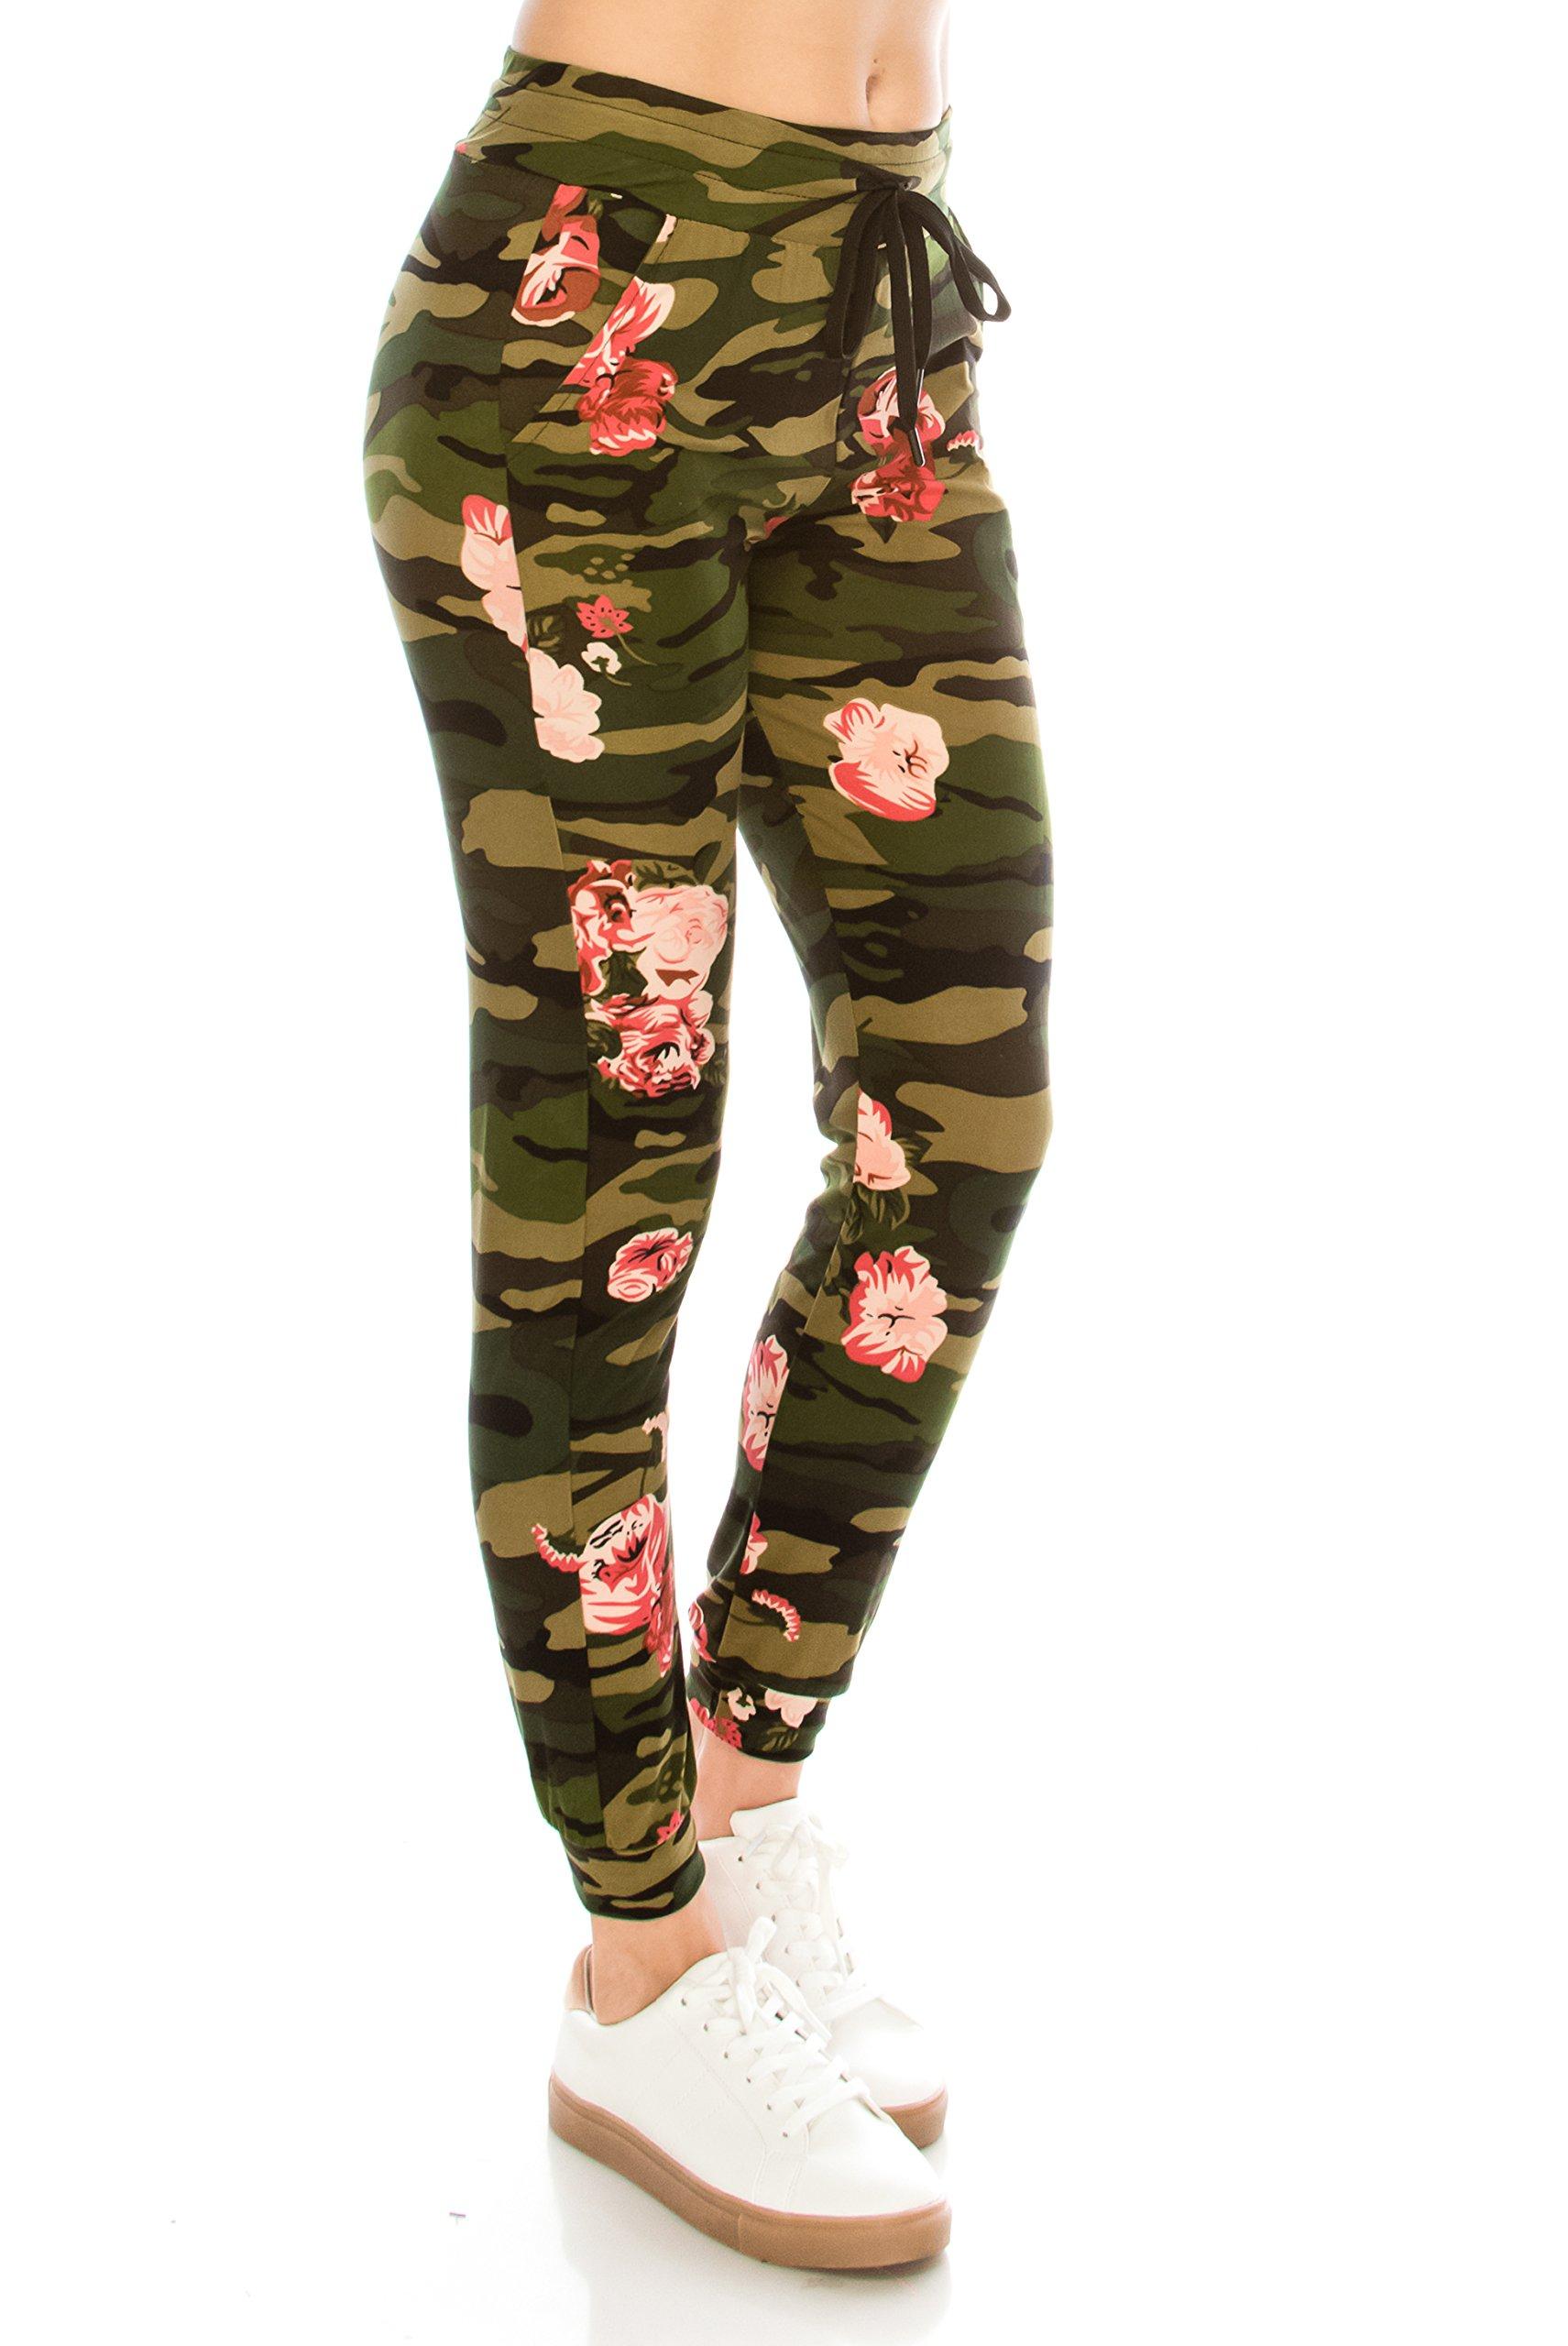 ALWAYS Women Drawstrings Jogger Sweatpants - Skinny Camo Soft Pockets Pants S/M